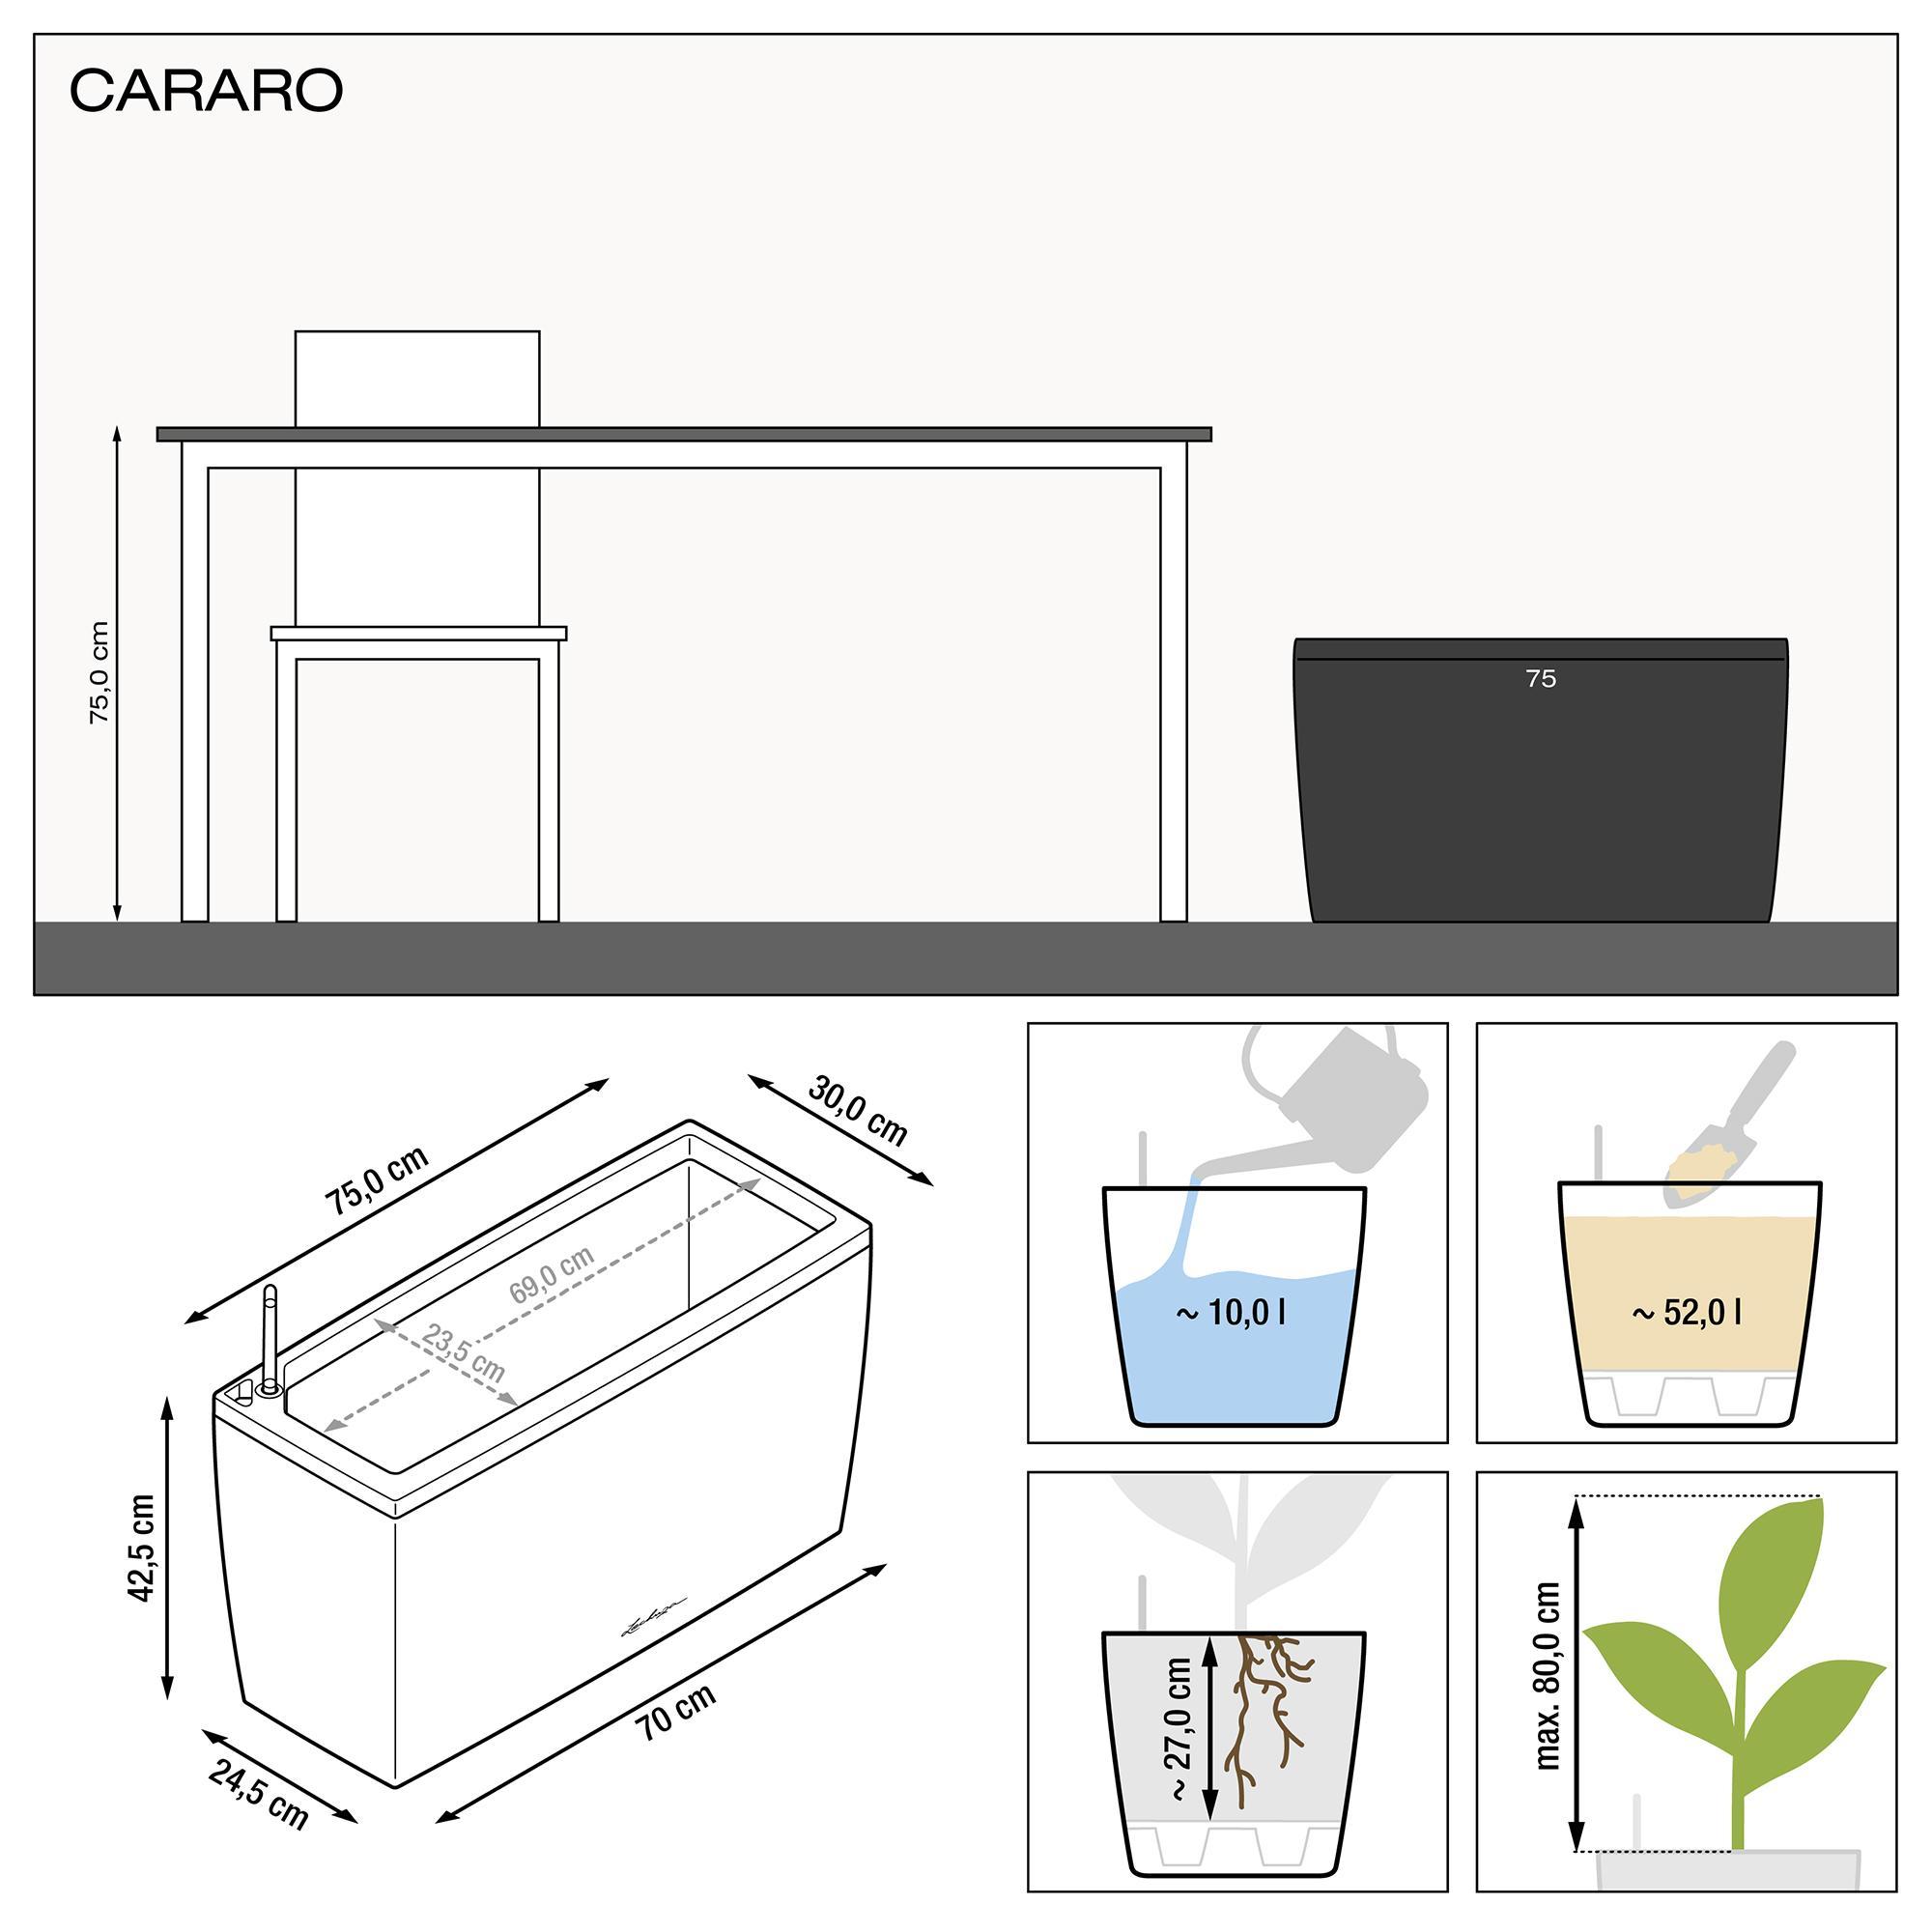 le_cararo_product_addi_nz